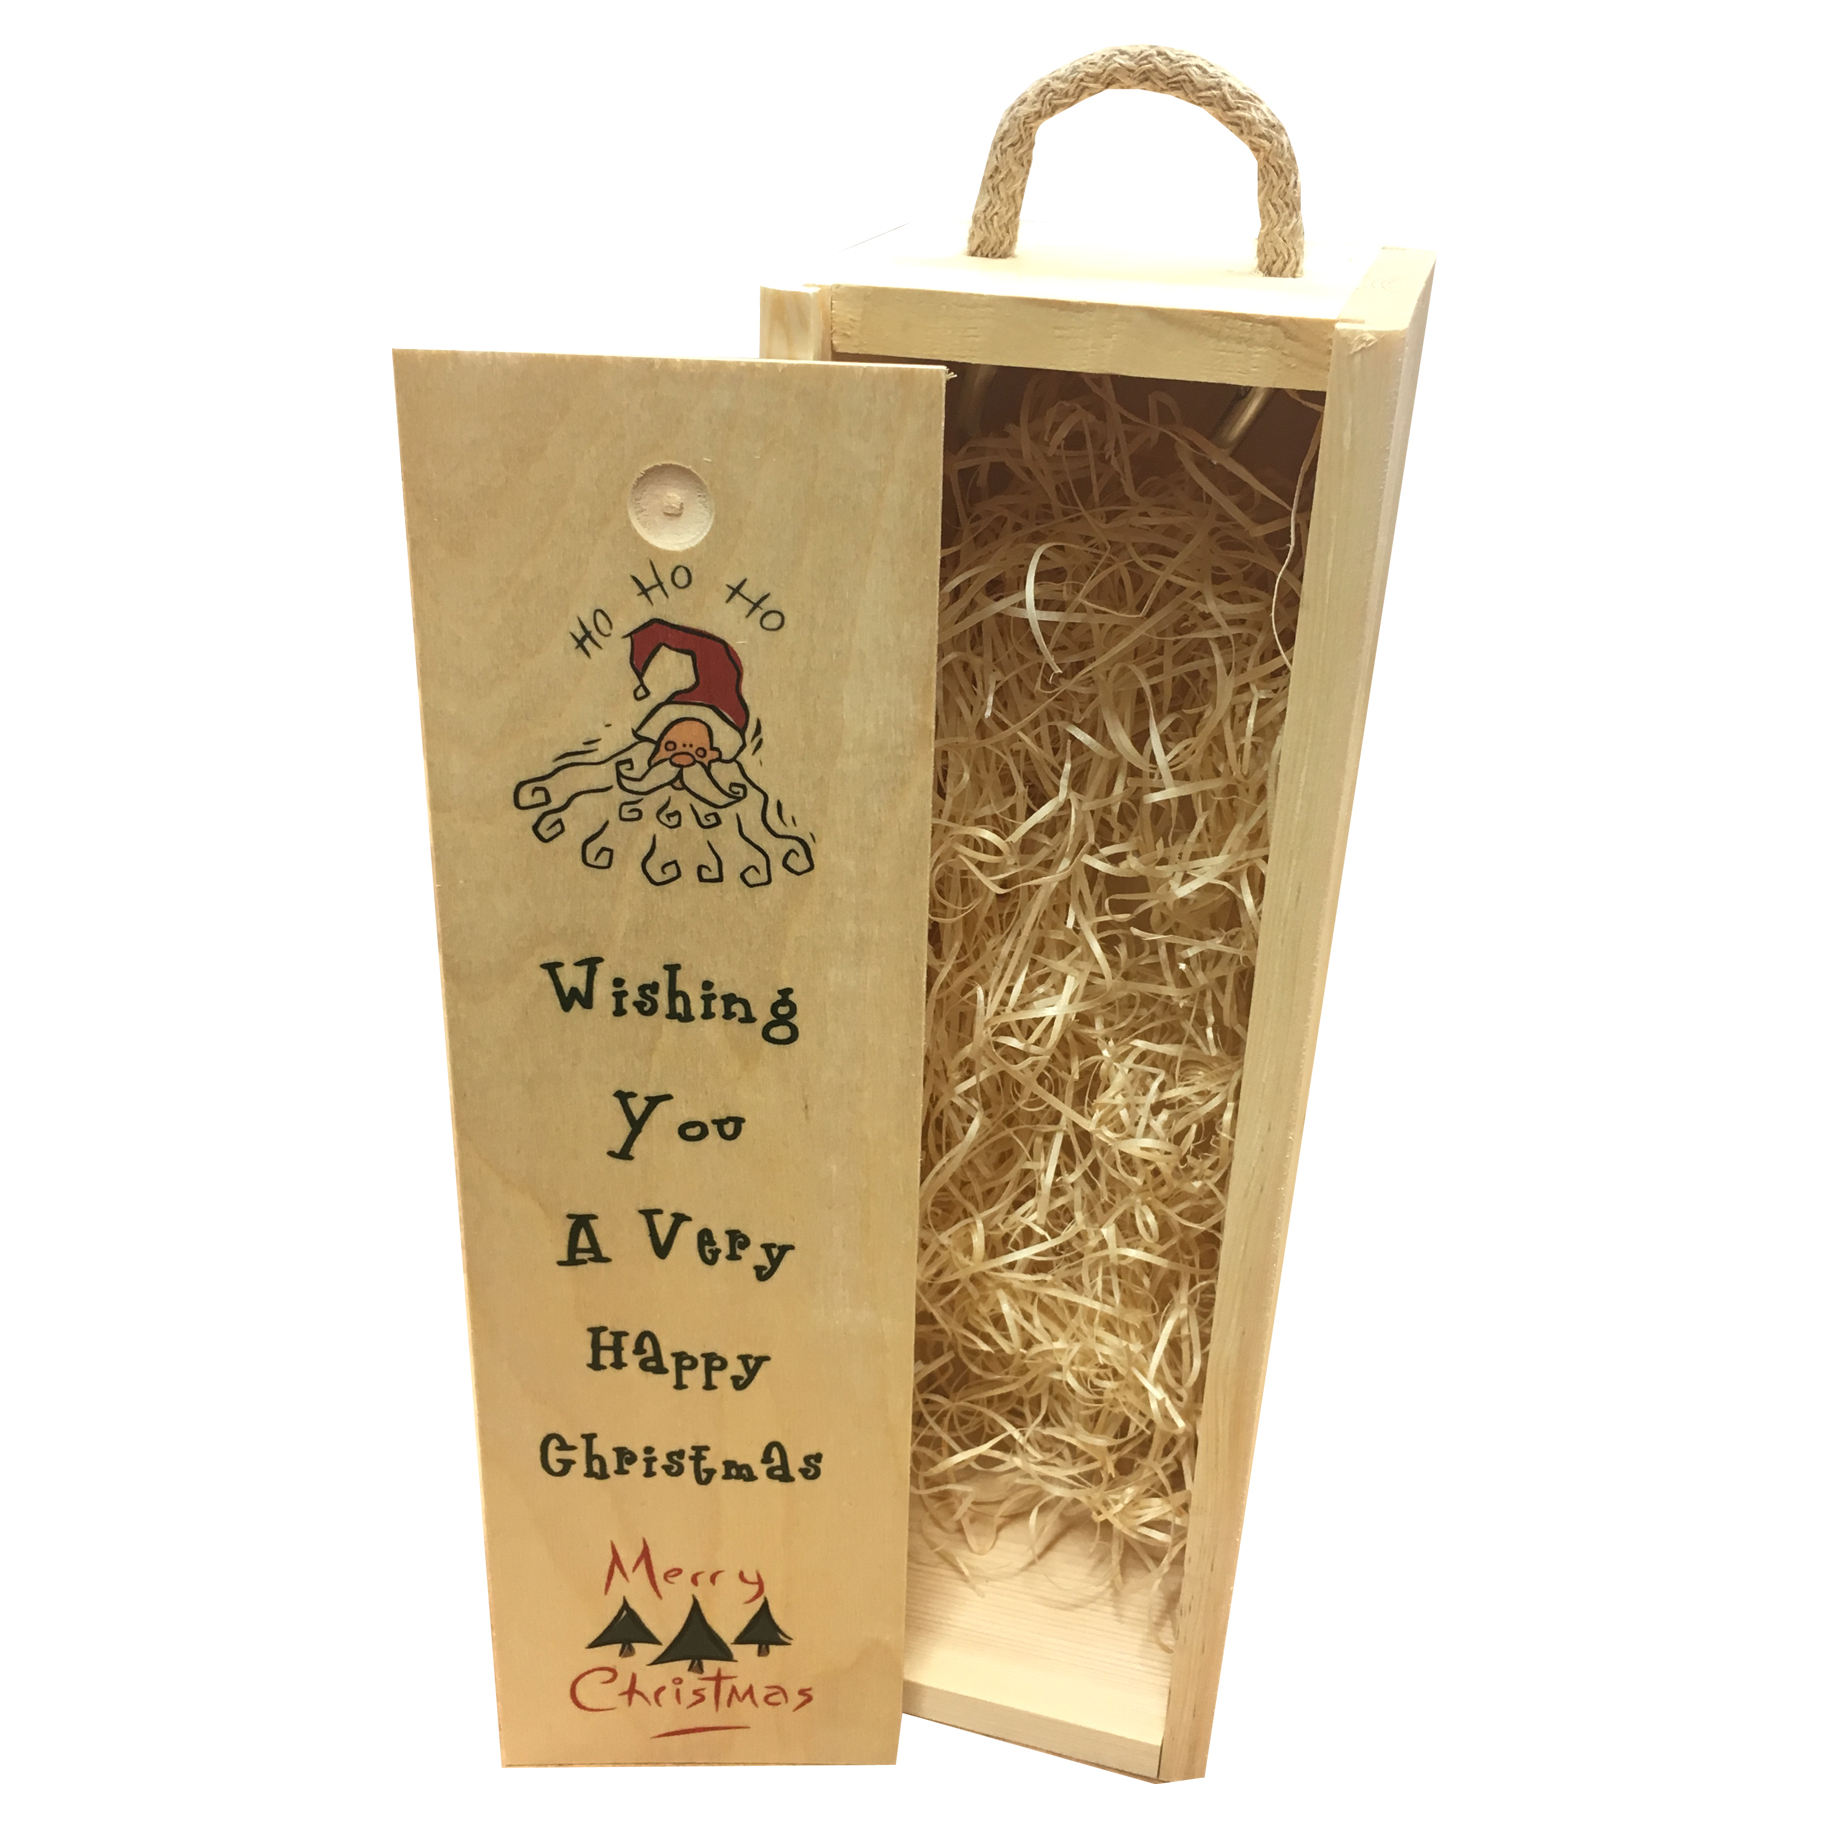 Wishing you a very happy Christmas wine box